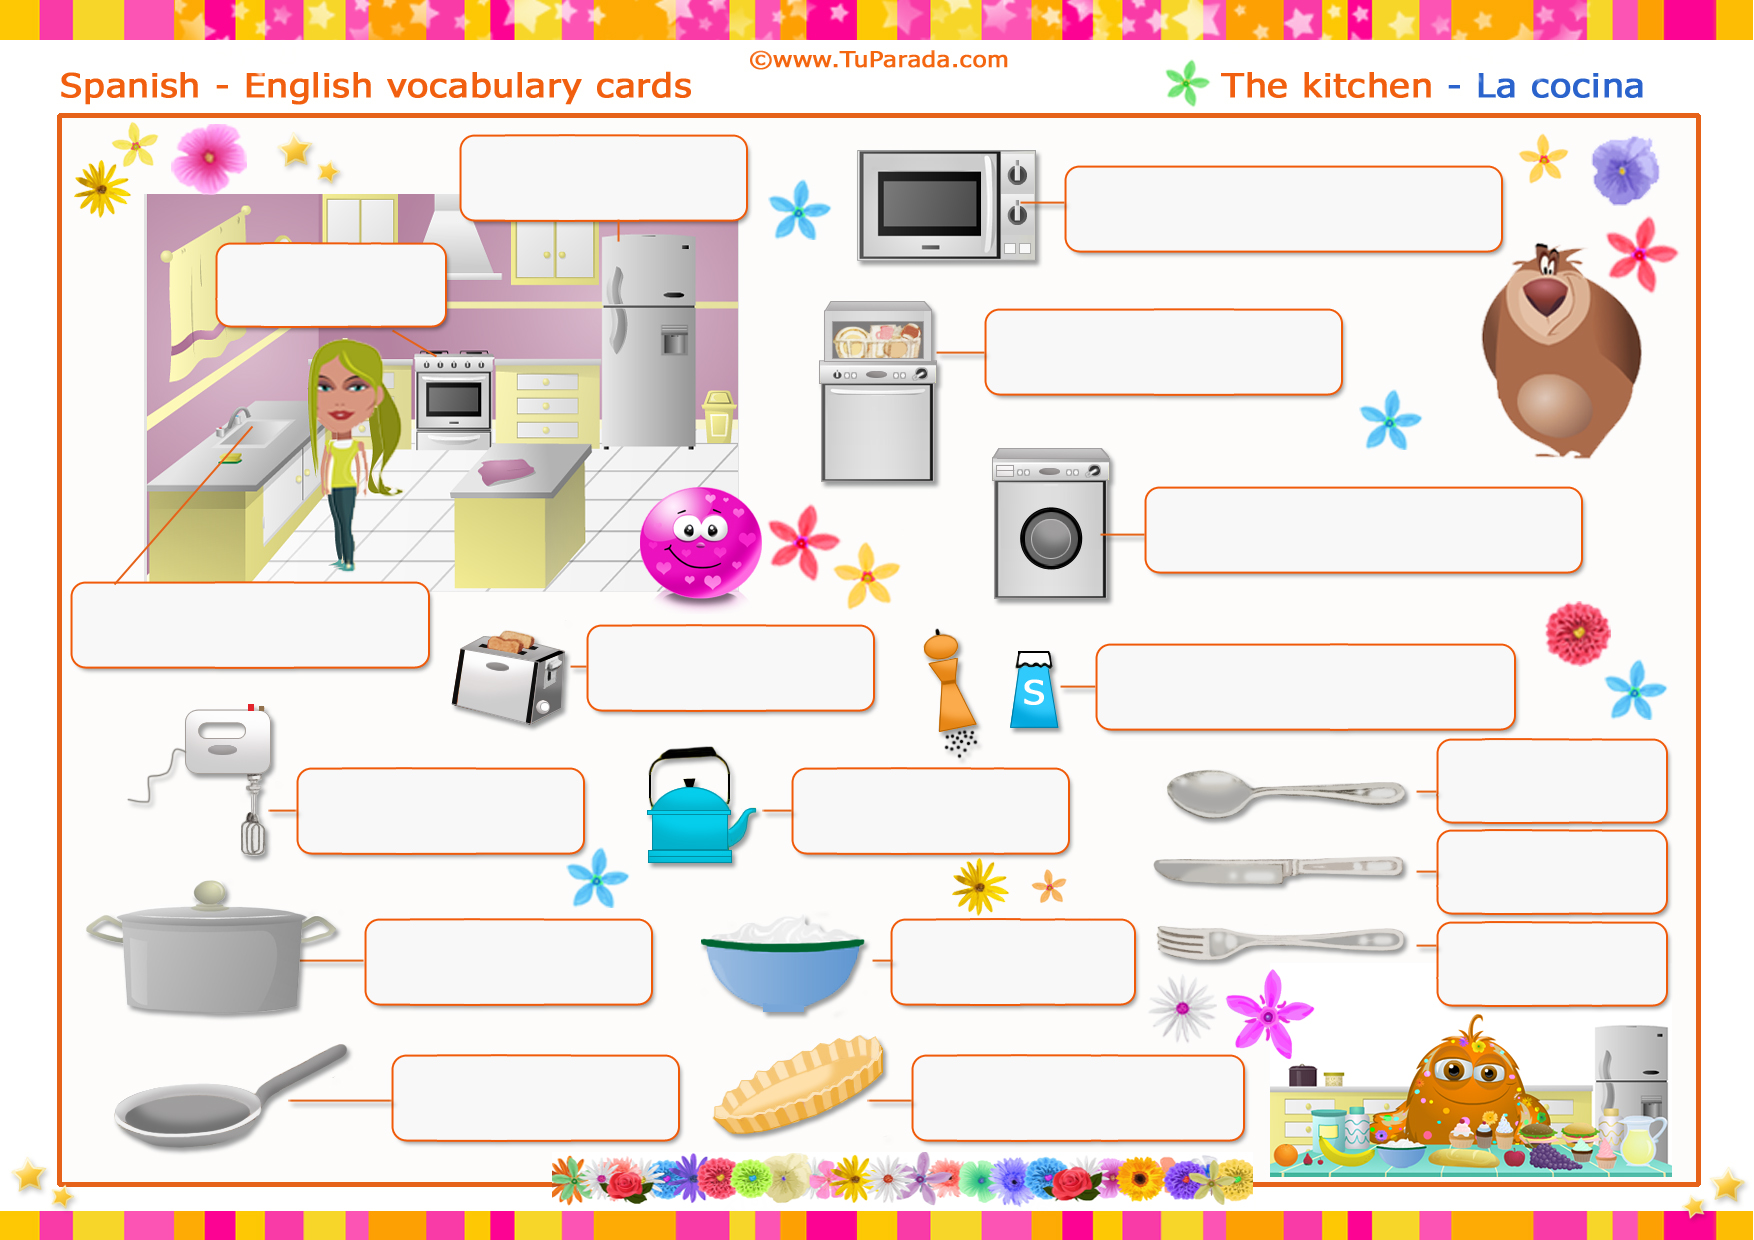 Tarjeta - Vocabulario: Cocina - Kitchen. Imprimir.